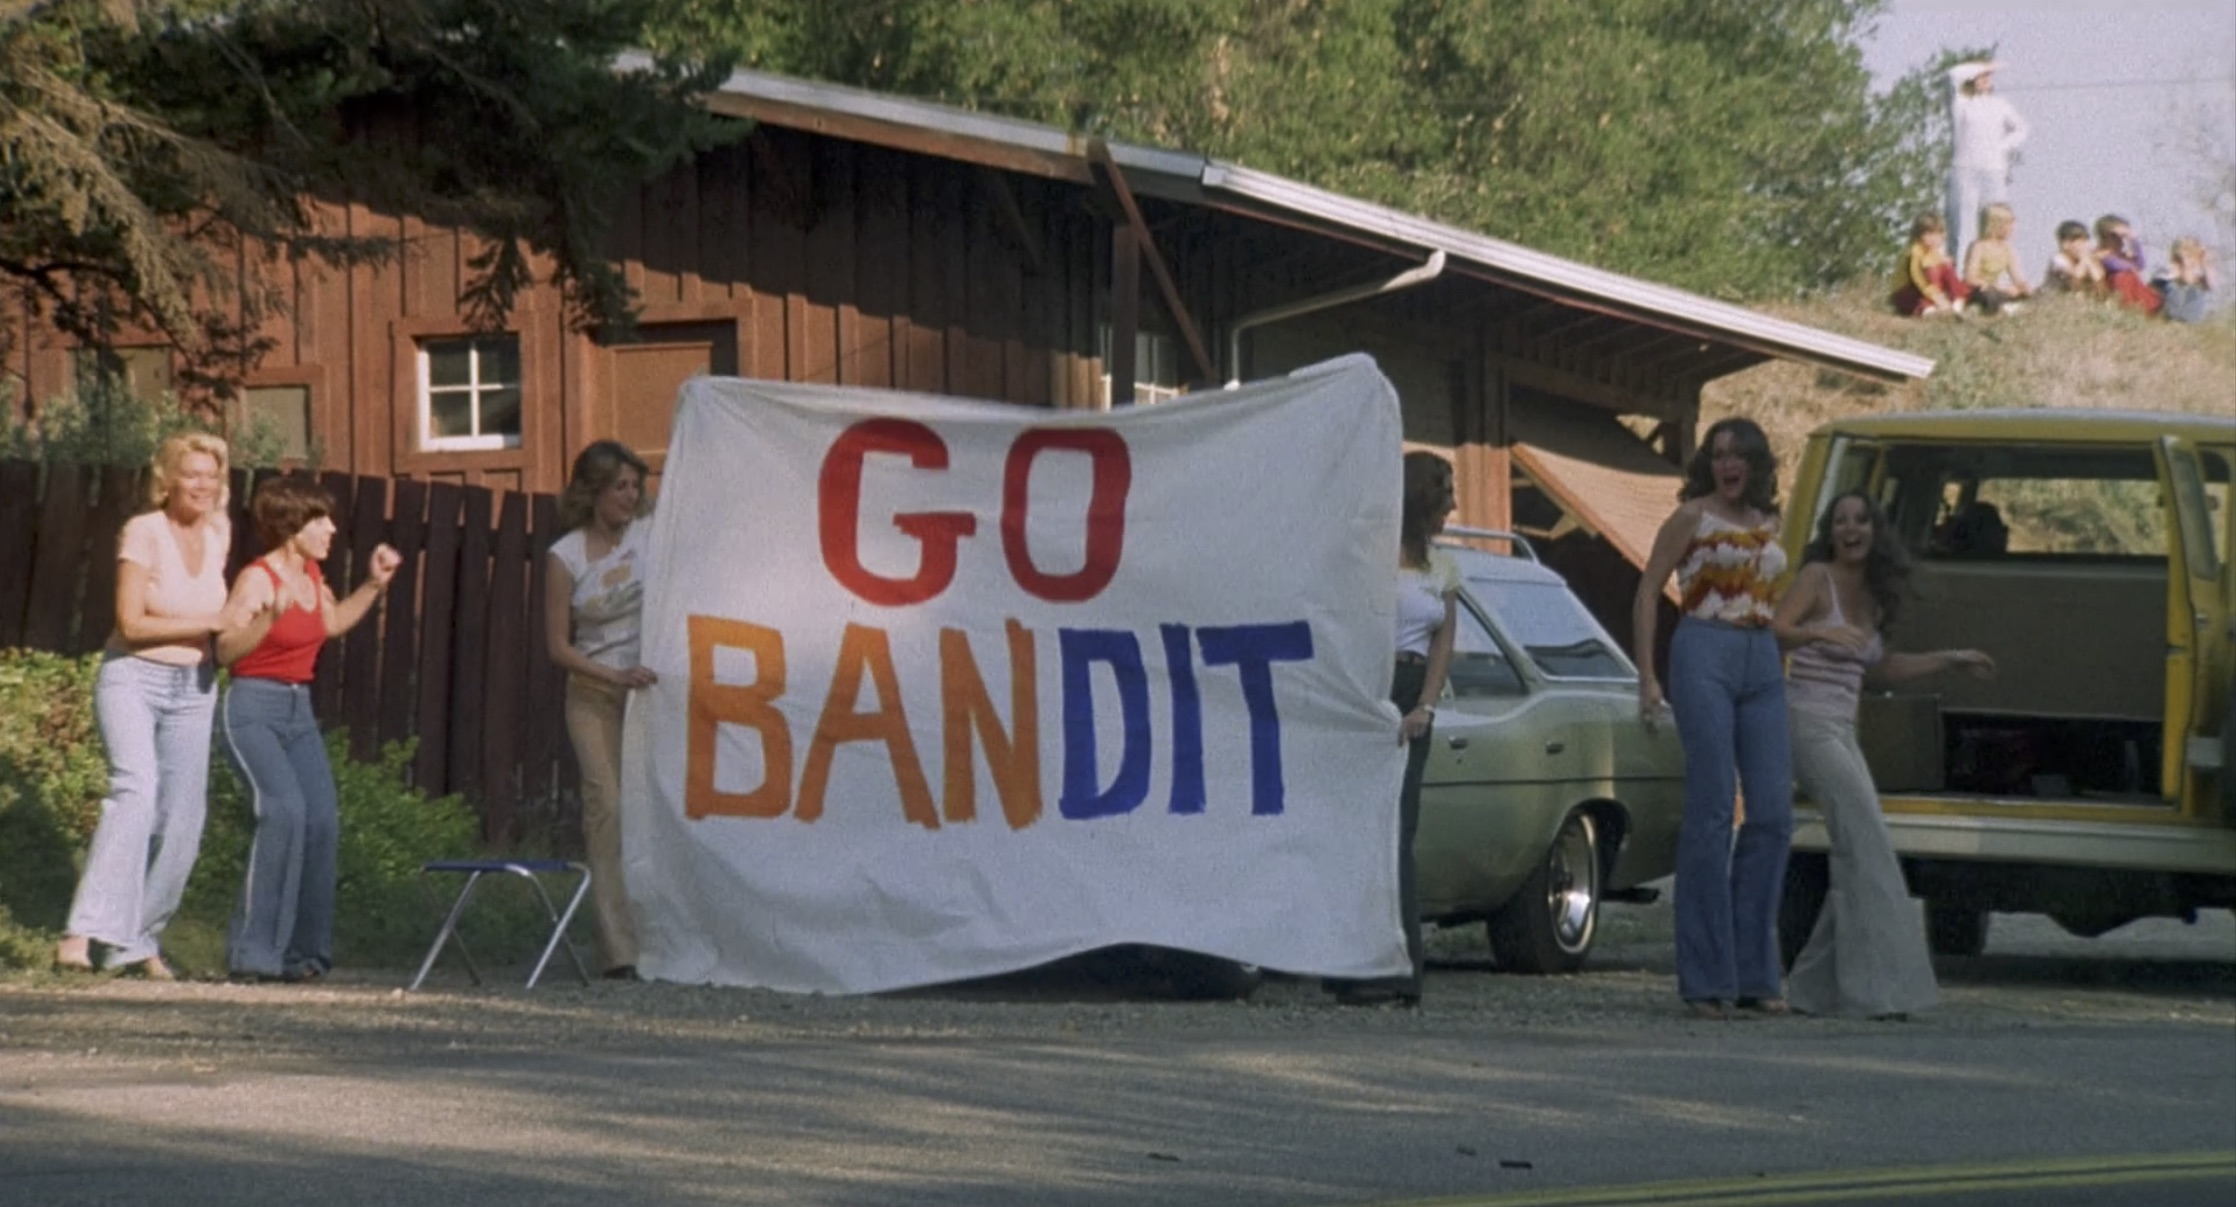 Smokey and the bandit go bandit sign